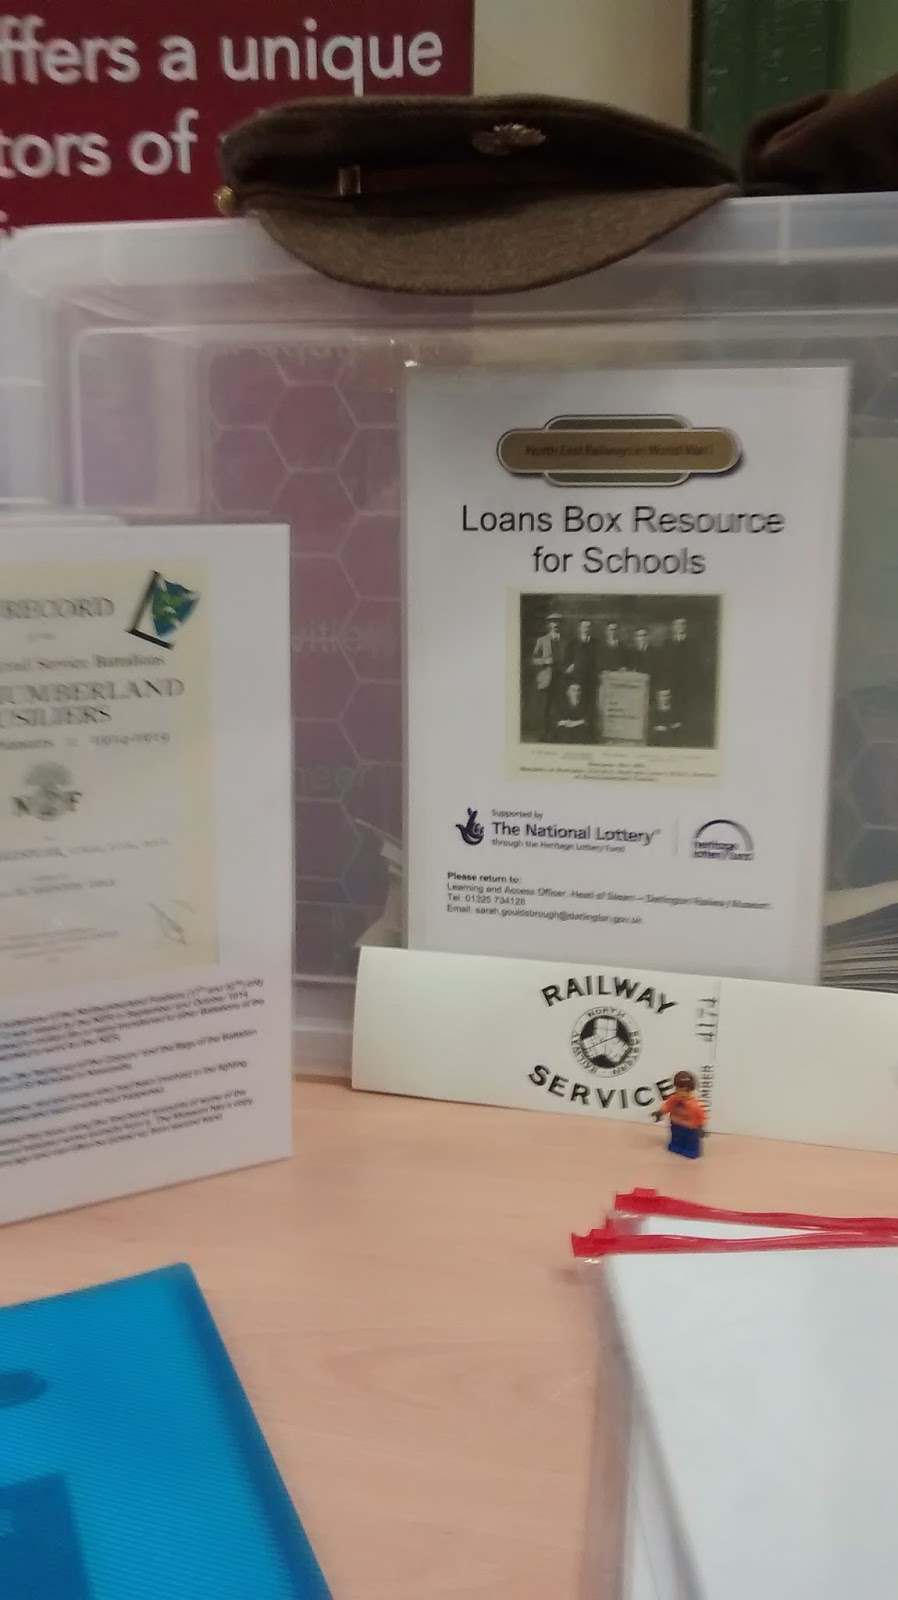 image of Loans Box